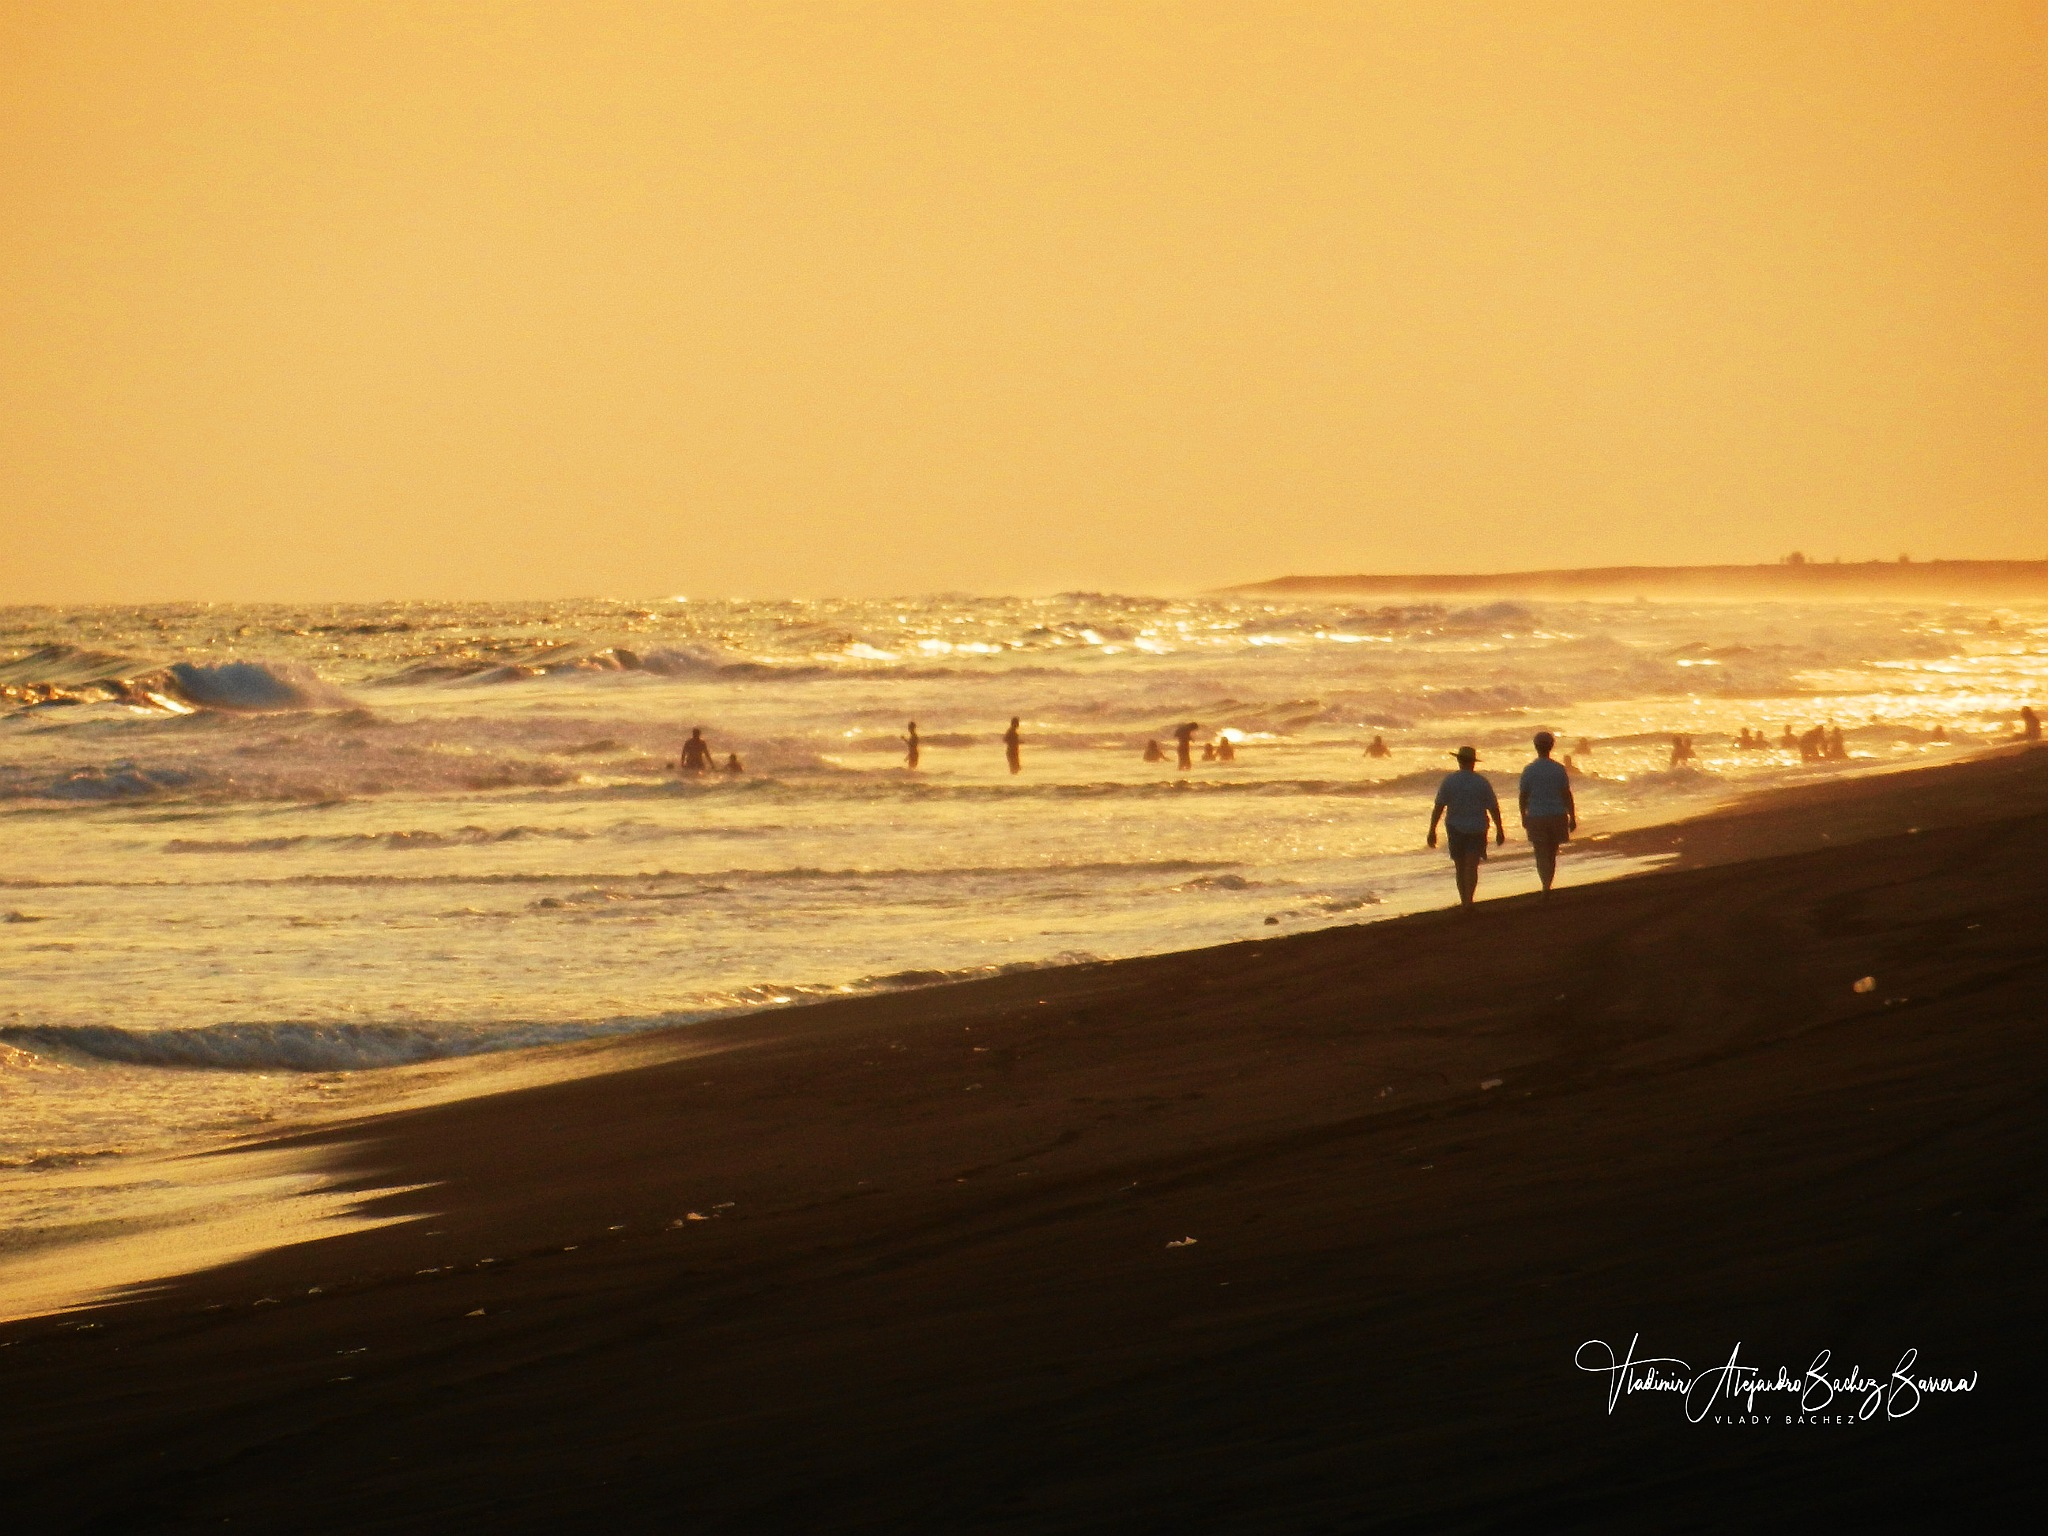 Playa Dorada by vladybachez